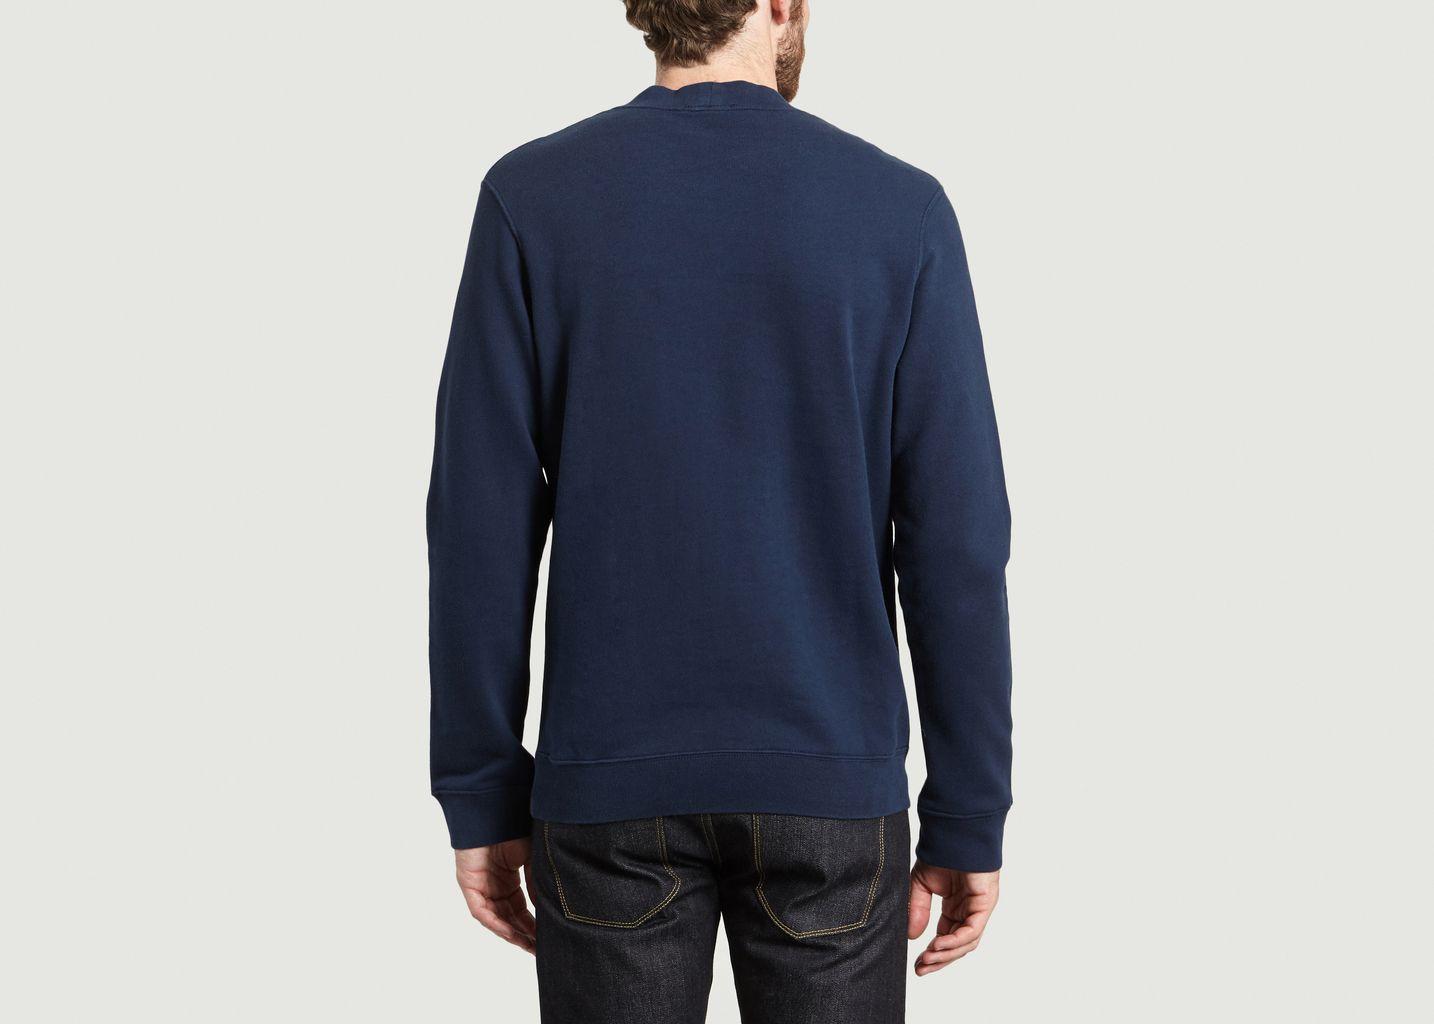 Sweatshirt Imprimé Cheval  - Editions M.R